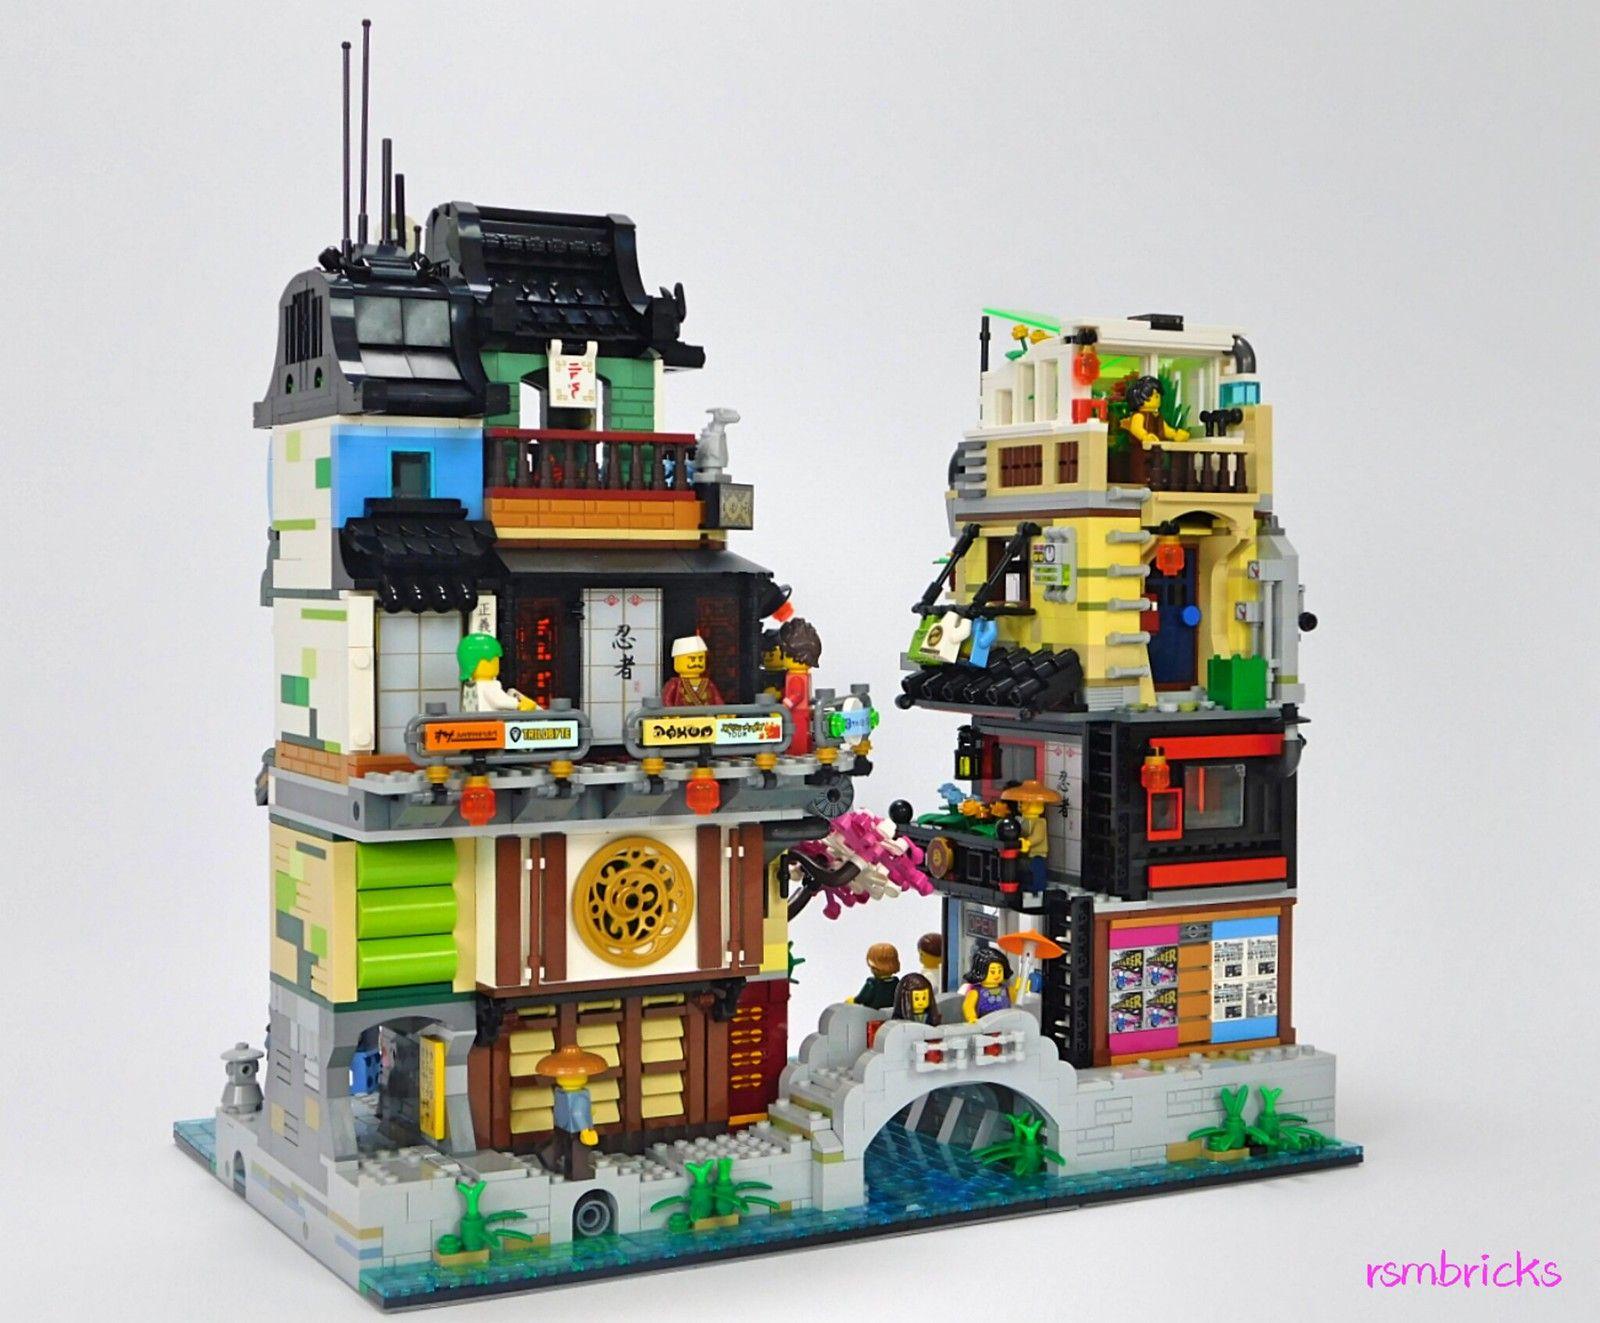 Ninjago City : The Suburbs (An extension to Lego set 70657 Ninjago City  Docks) | Lego ninjago city, Lego, Lego ninjago